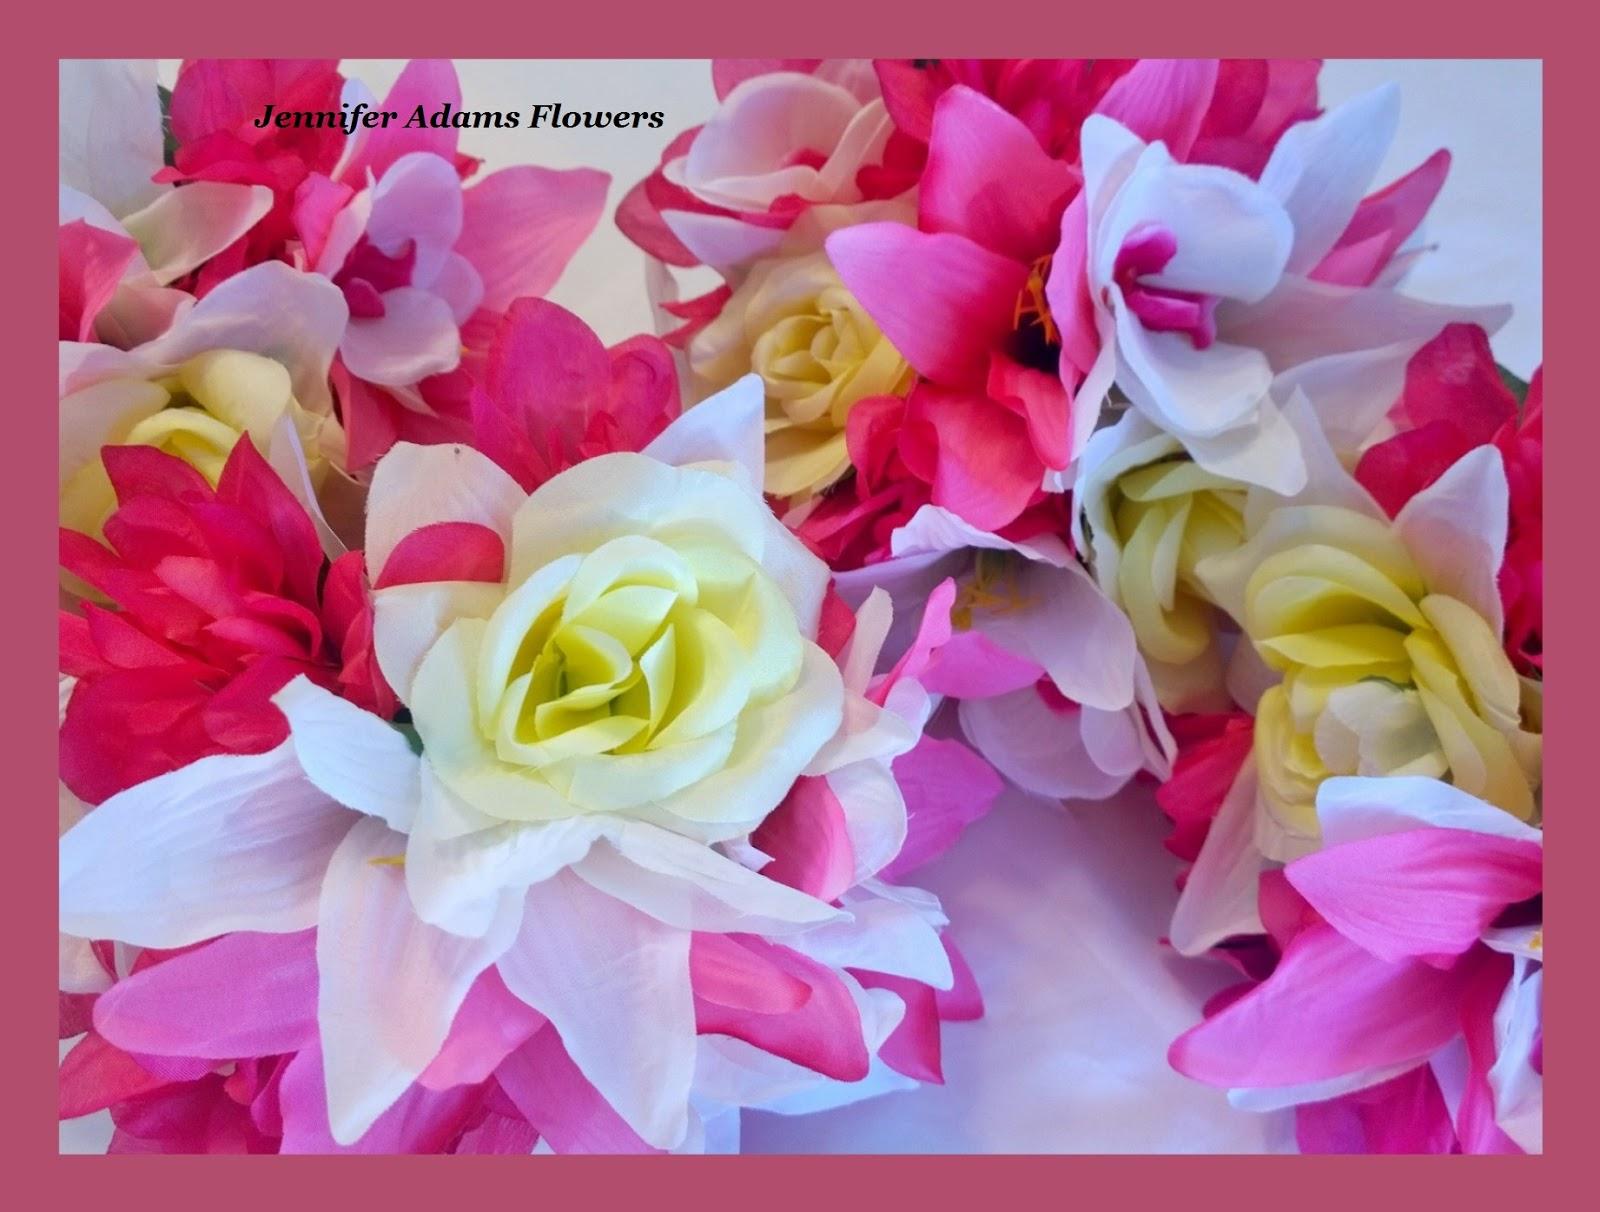 Jennifer Adams Flowers 17 Pc Wedding Package Lilies Dahlias Roses &